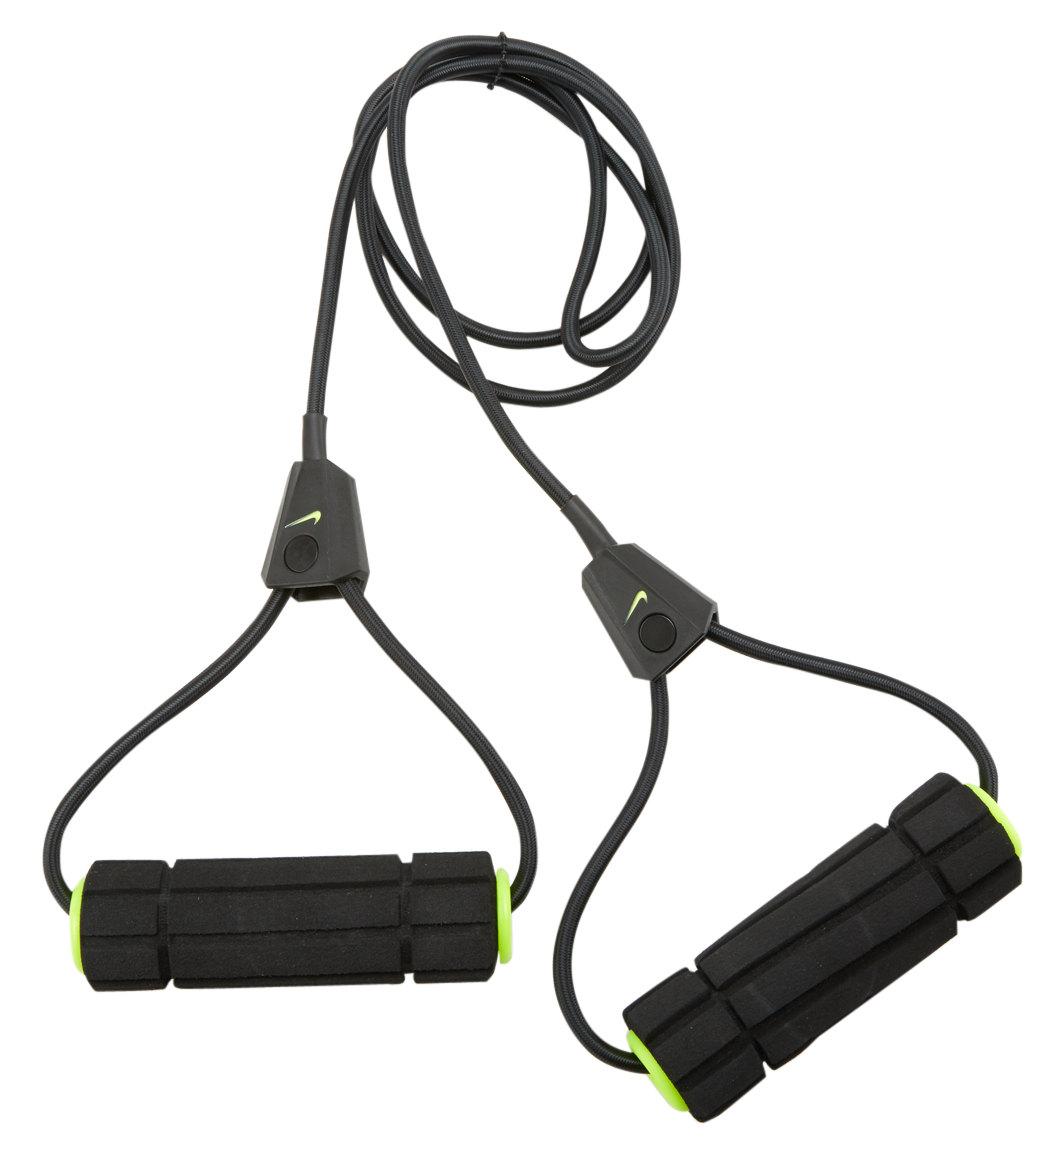 8e9a54376e02 Nike Long-Length Medium Resistance Band 2.0 at SwimOutlet.com